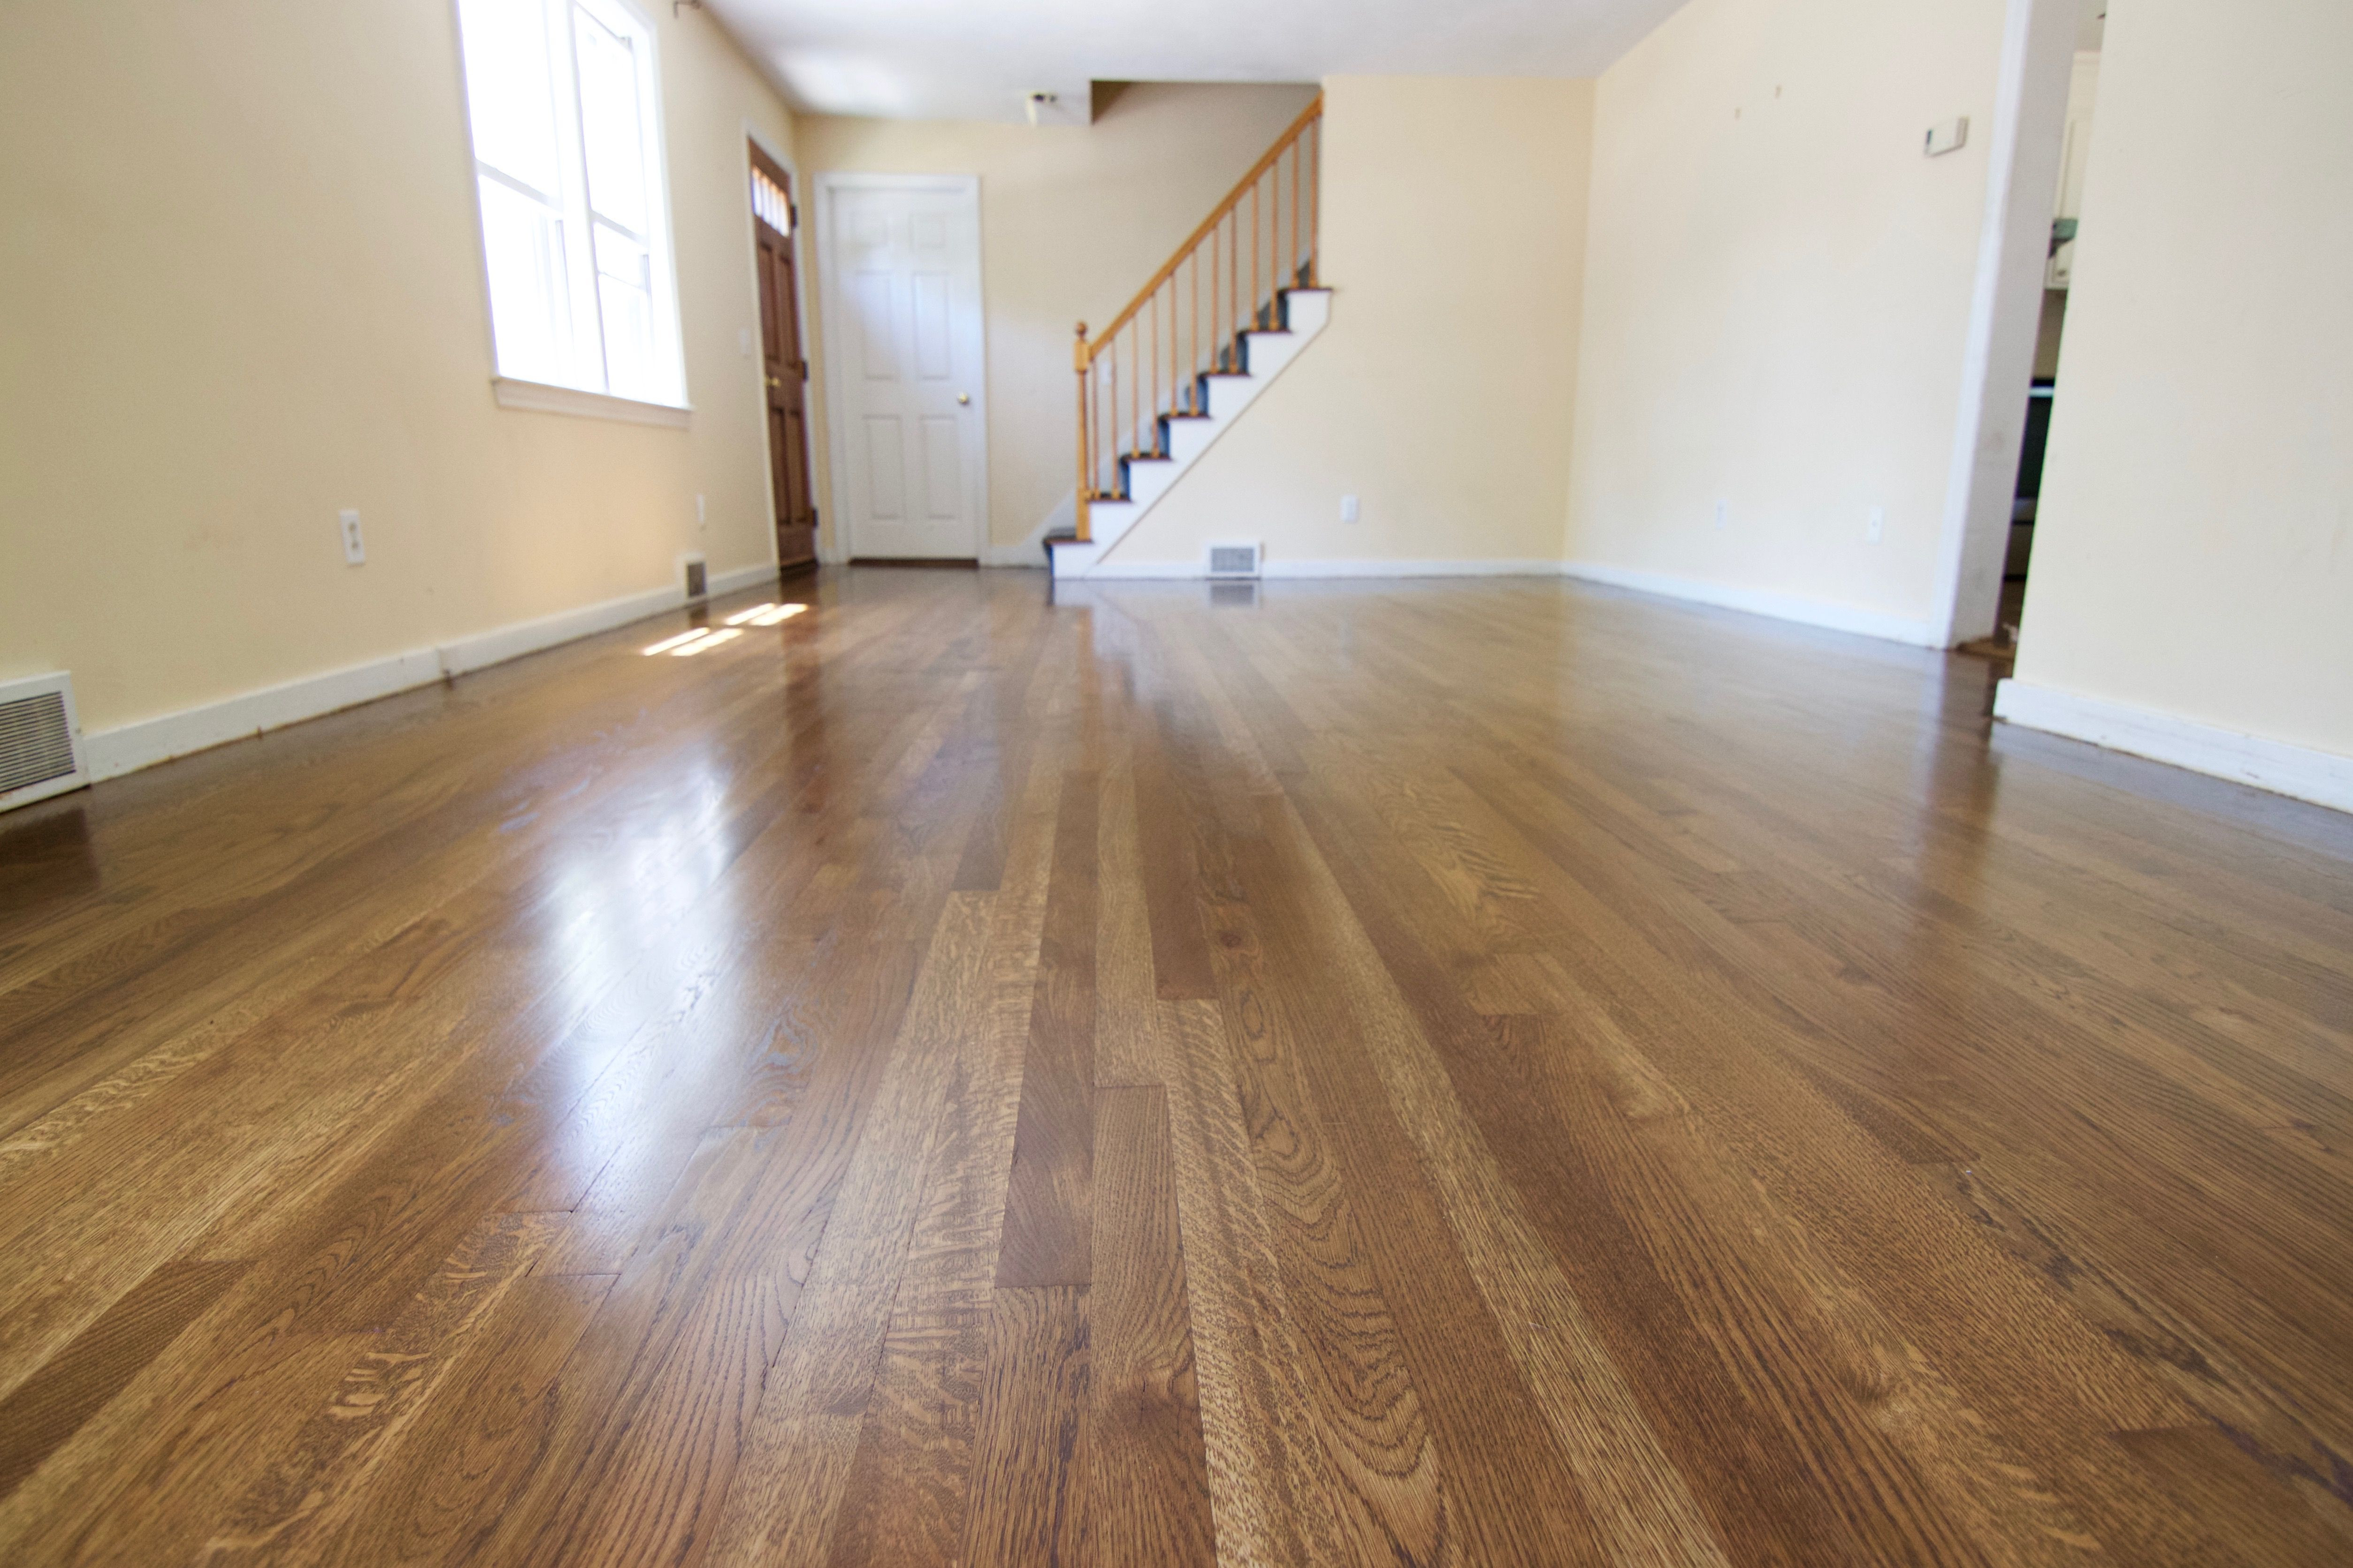 somerset white oak engineered hardwood flooring of fast floors floor pertaining to fast floors white oak hardwood flooring stained with bona medium brown dri